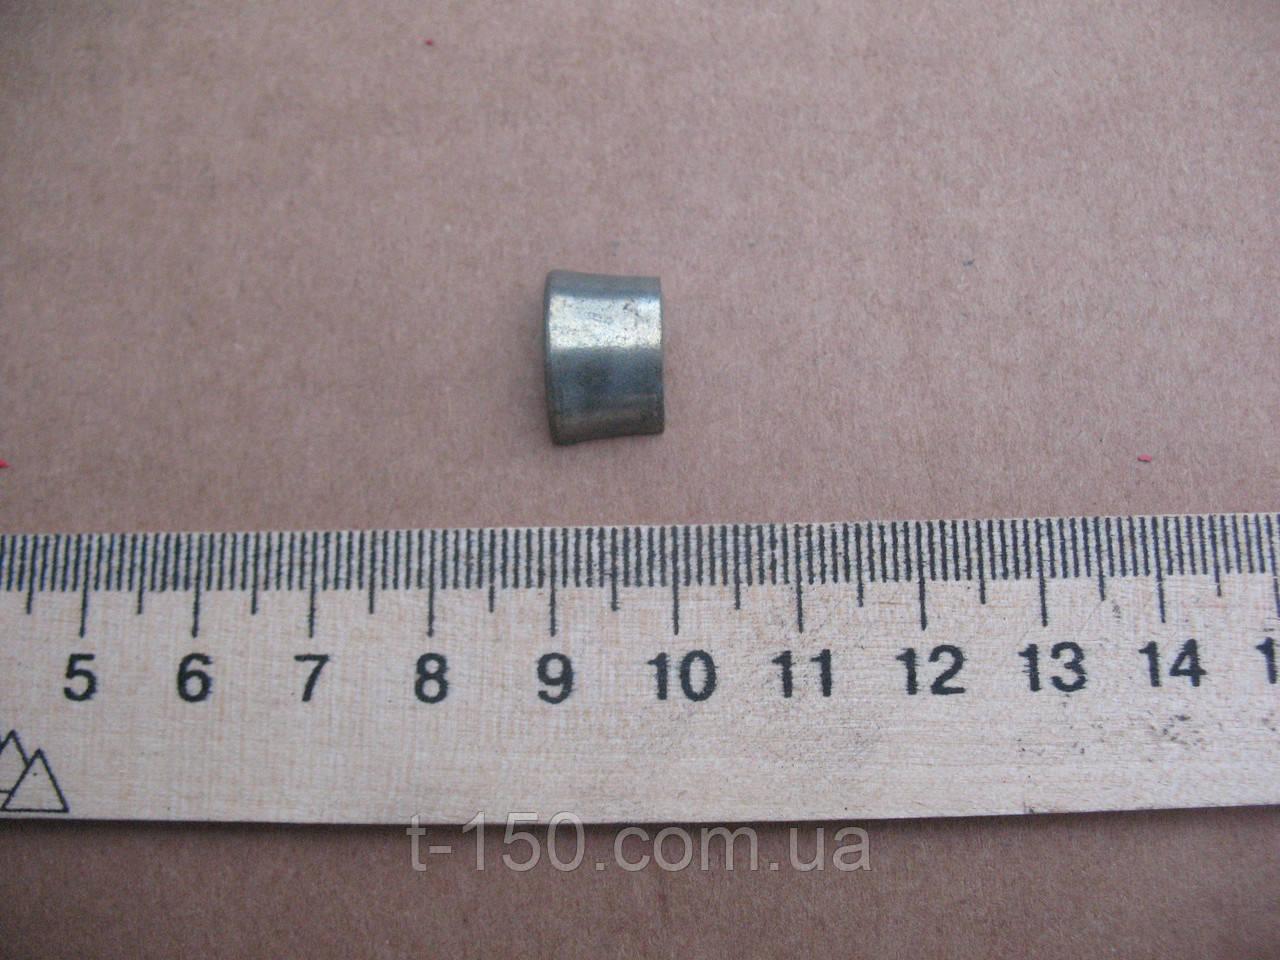 Сухарь клапана СМД 18-31 (14-0671Б)